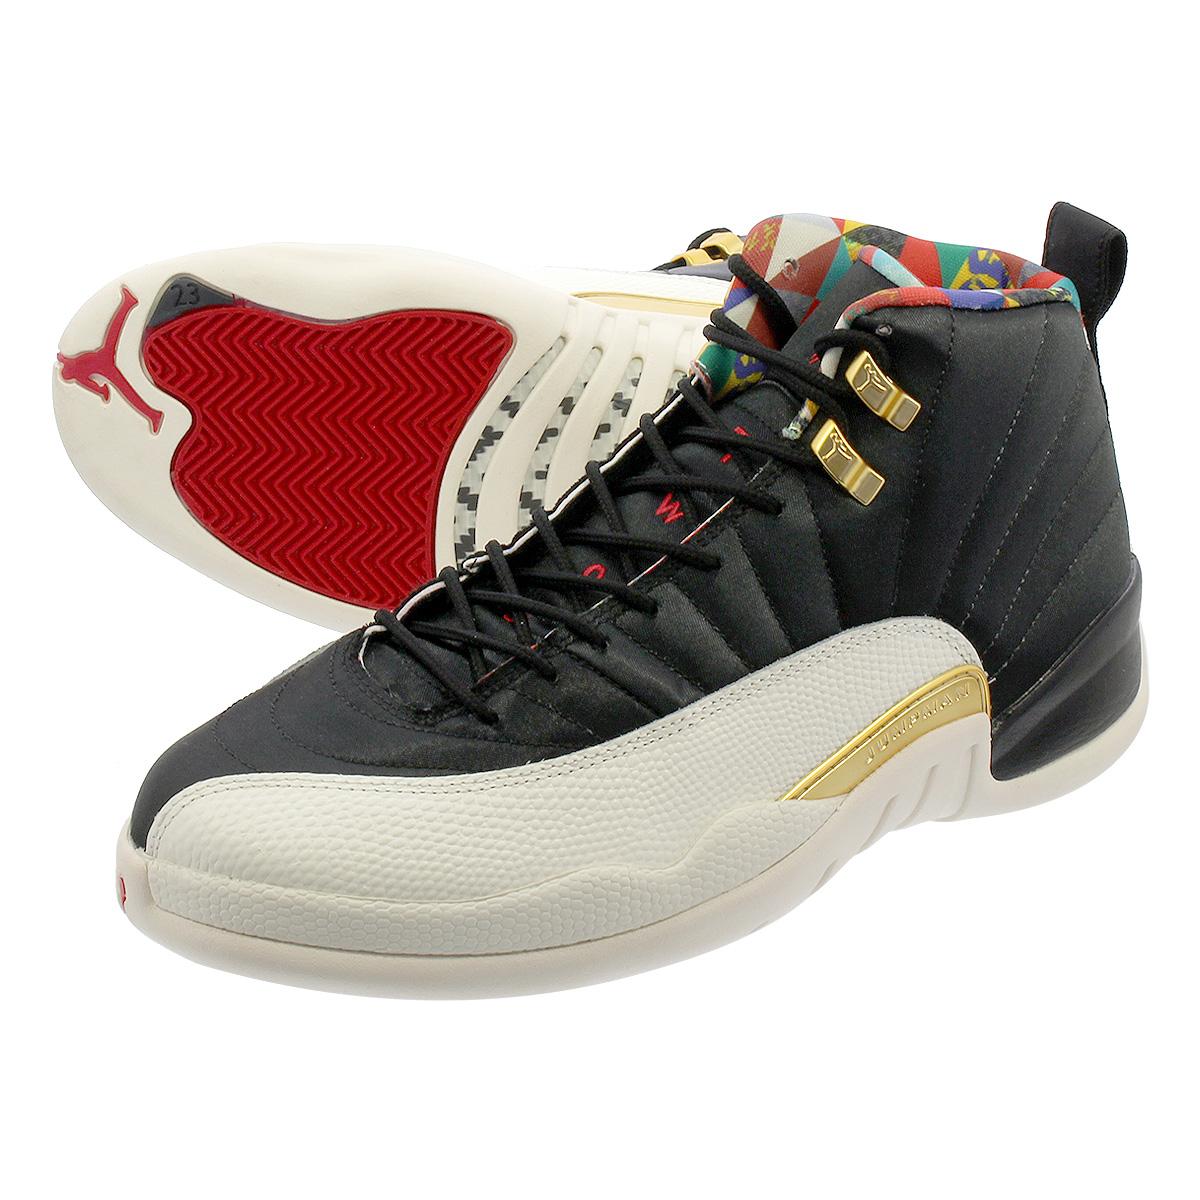 buy popular d73ce 51b39 NIKE AIR JORDAN 12 RETRO Nike Air Jordan 12 nostalgic BLACK/TRUE  RED/SAIL/METALLIC GOLD ci2977-006